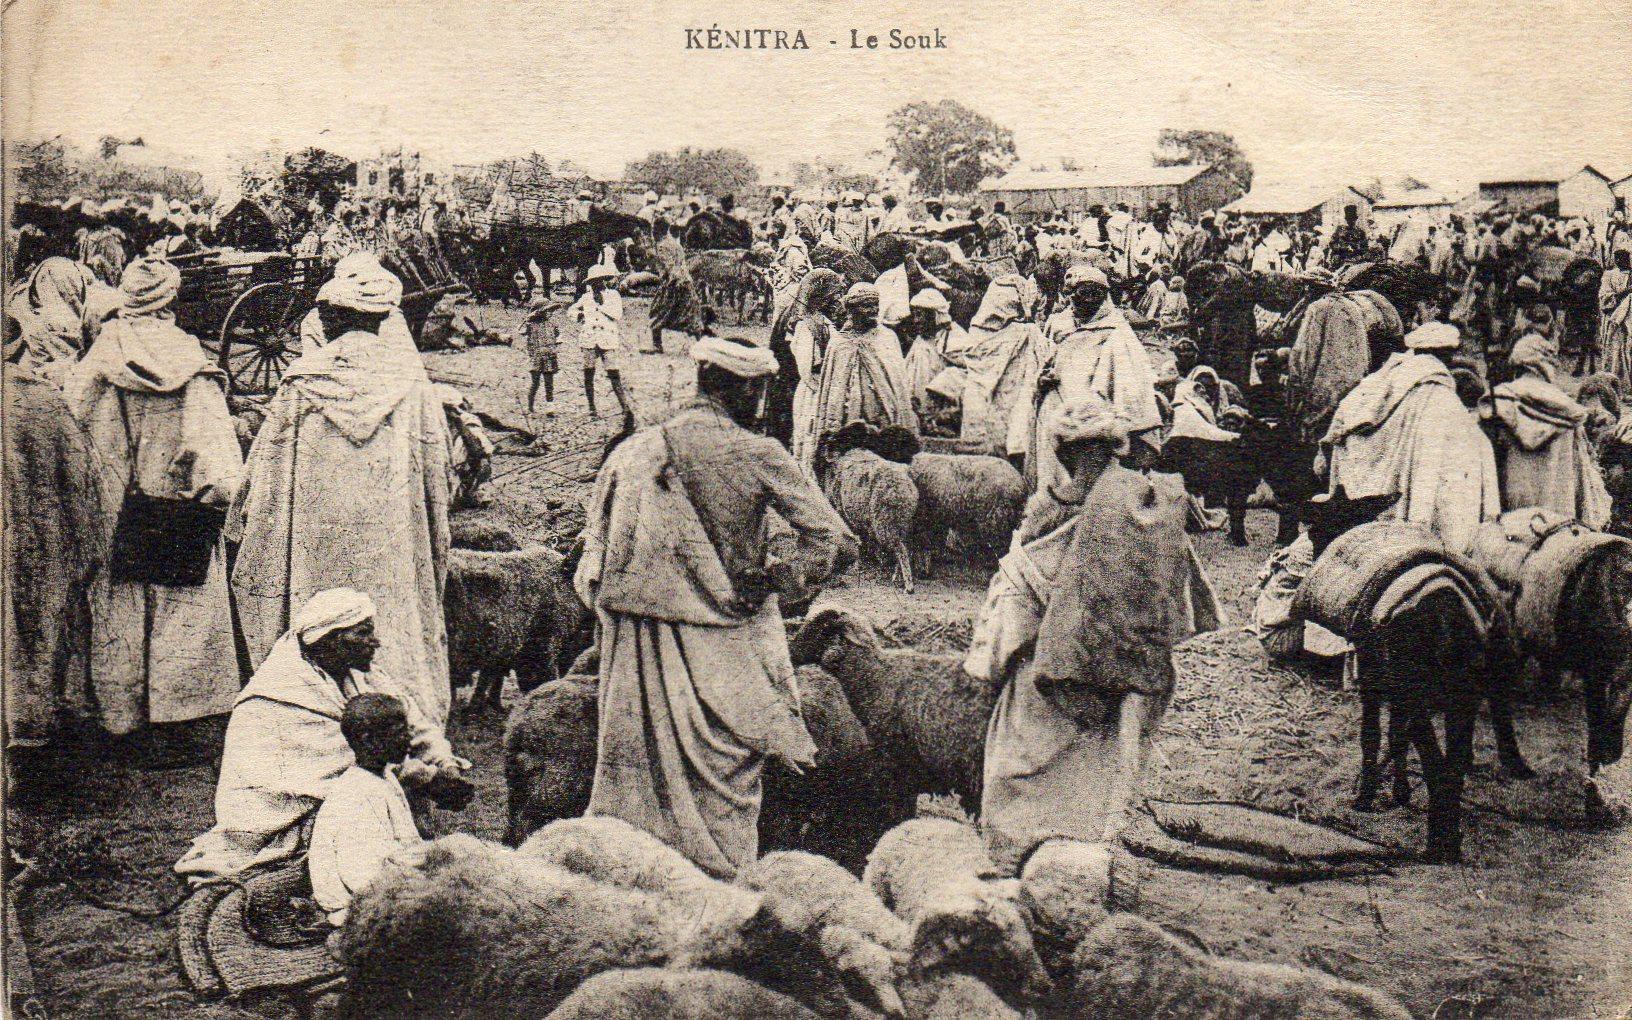 Marocco, Kenitra